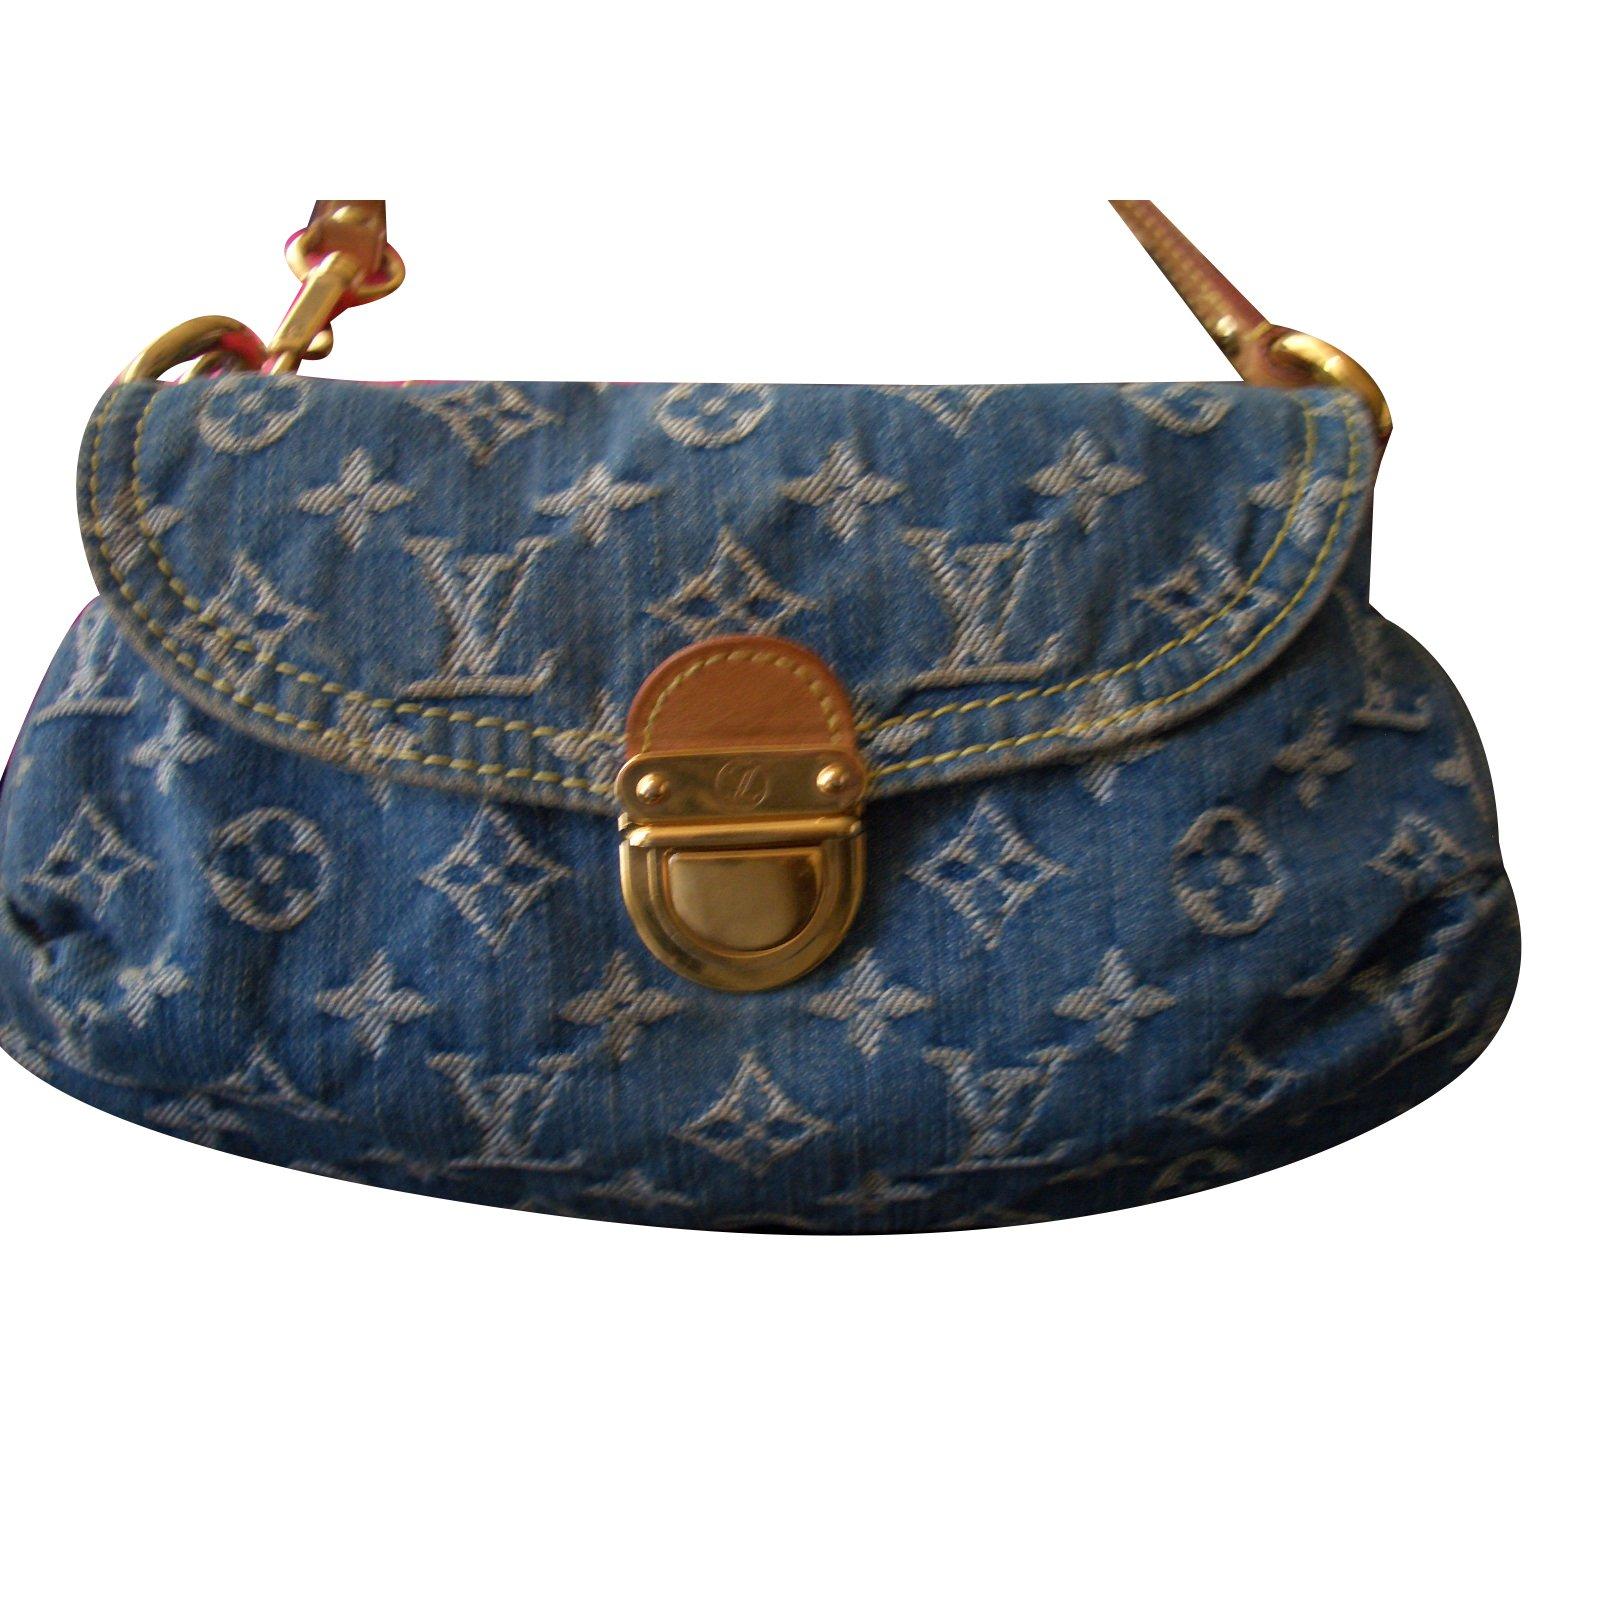 Louis Vuitton Handbag Handbags Denim Blue Ref 31391